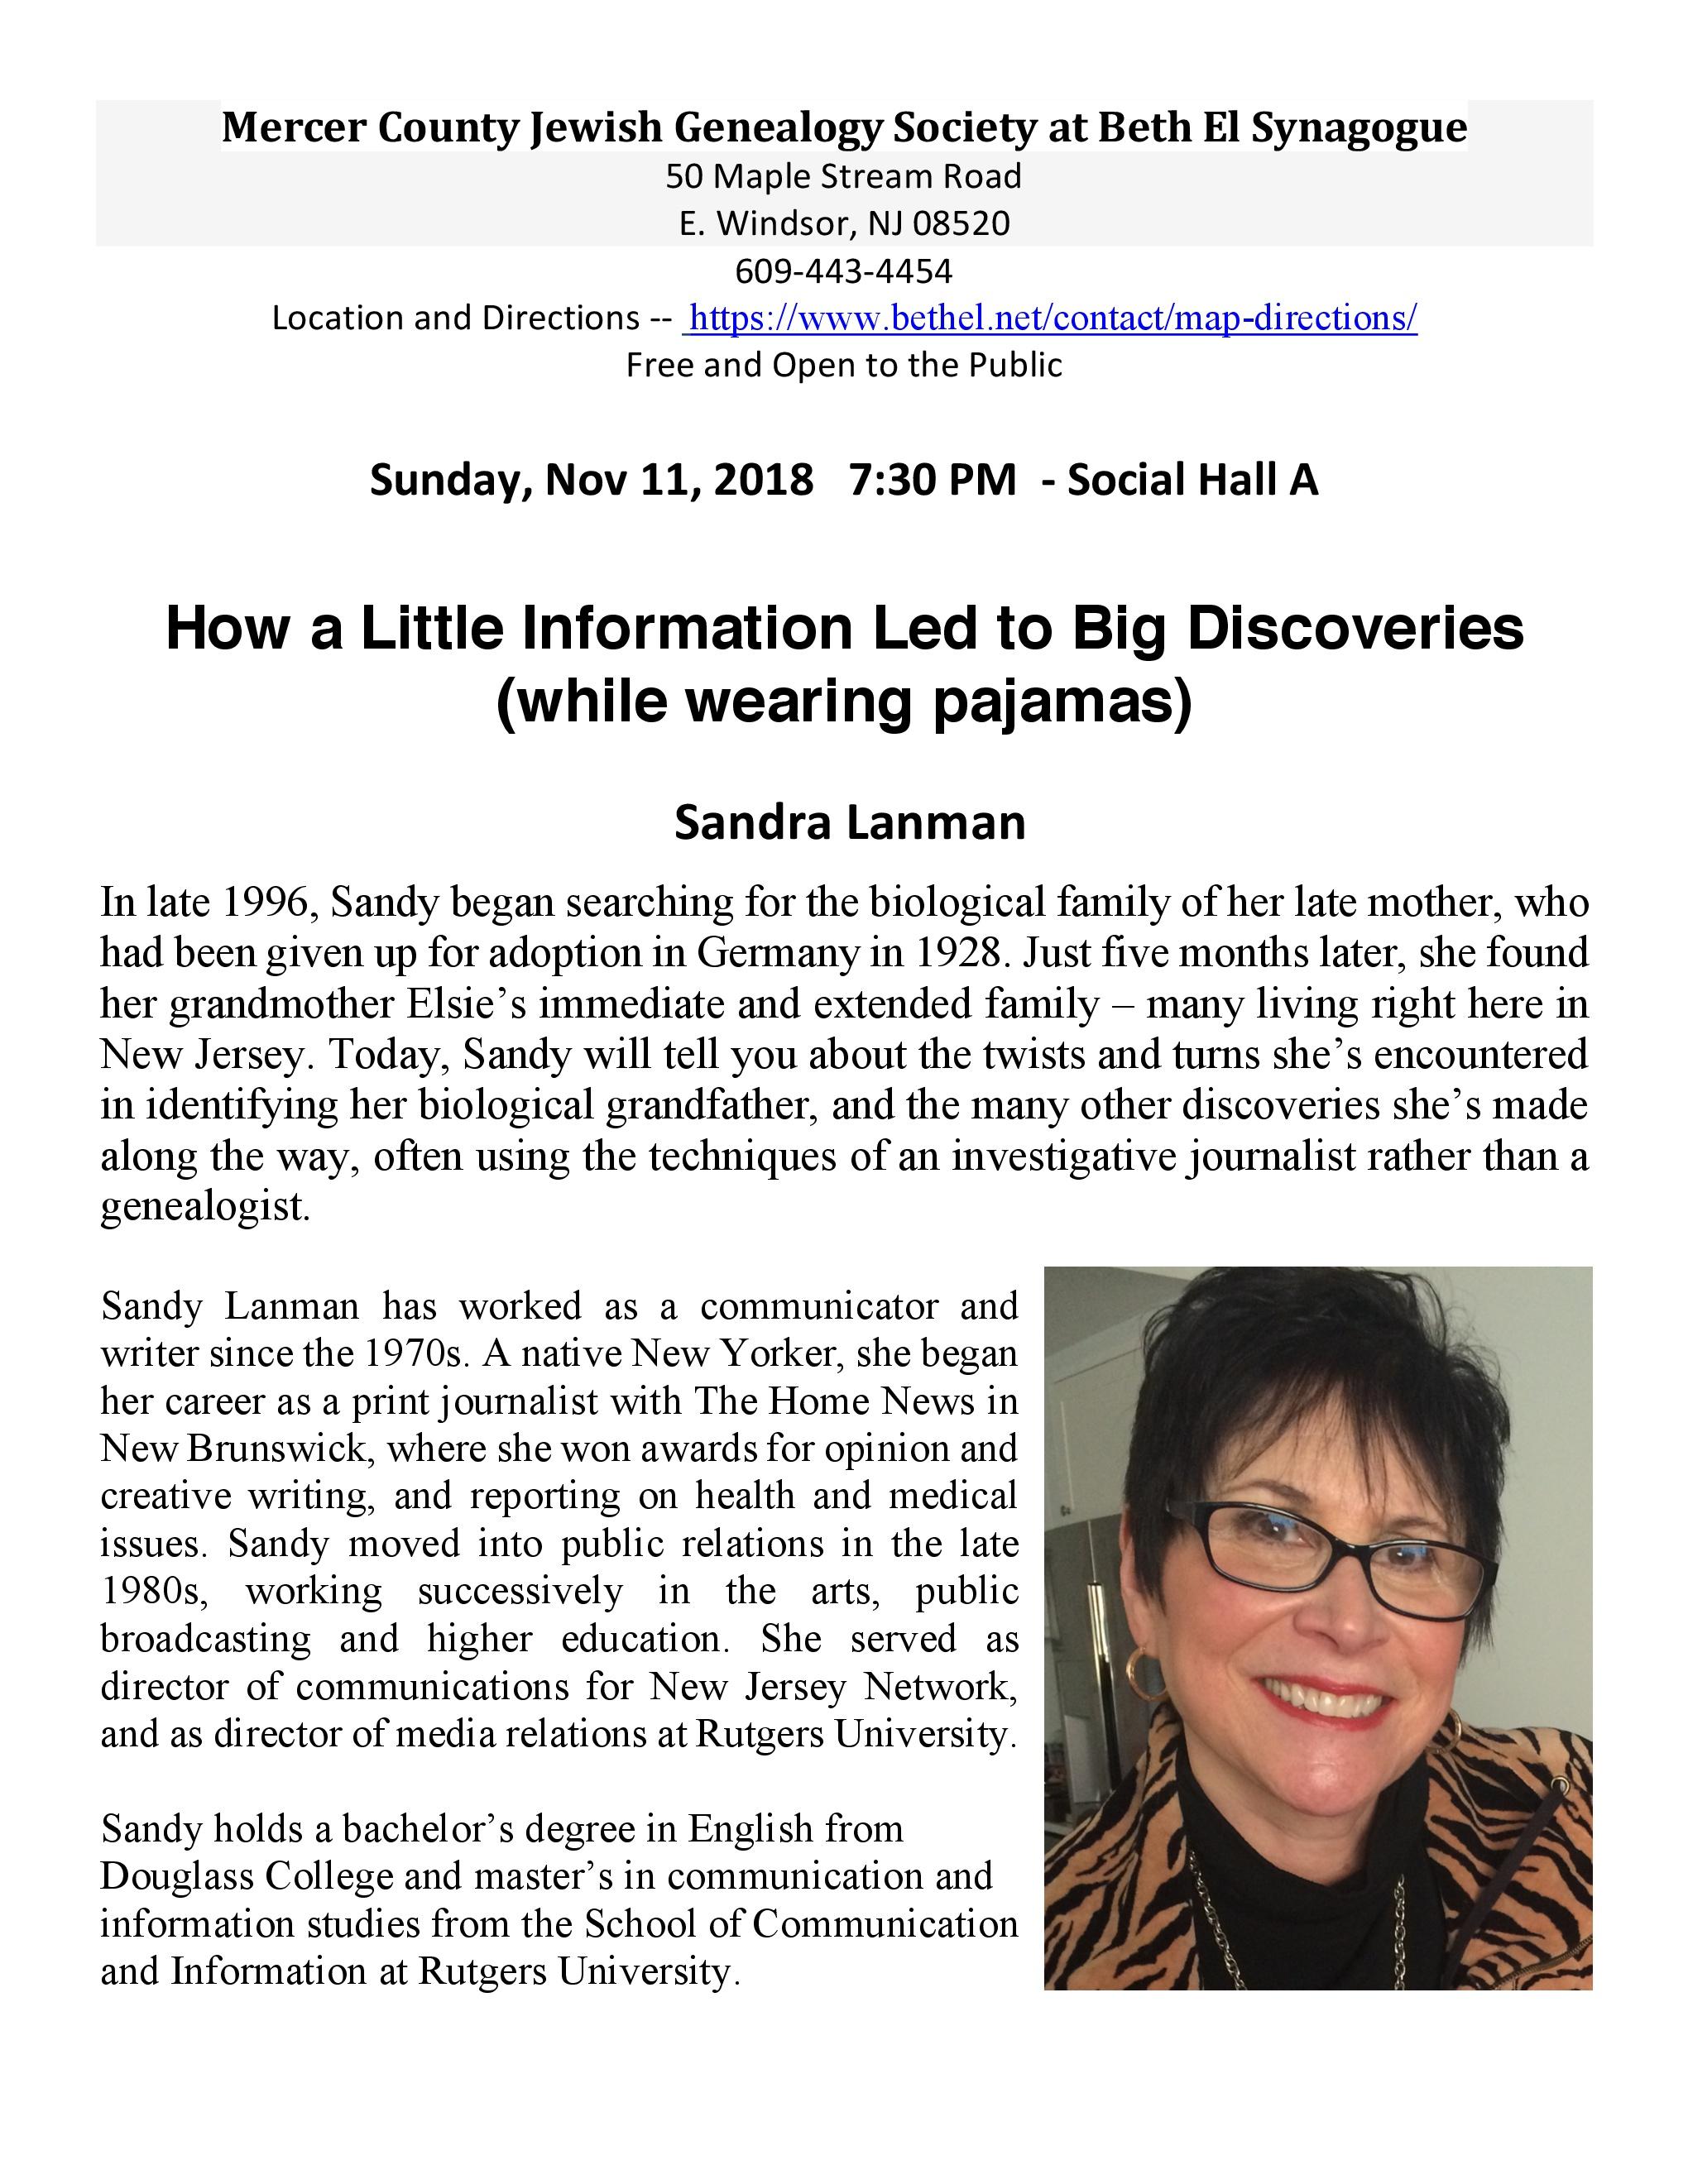 Sandra-Lanman-Nov-11-2018